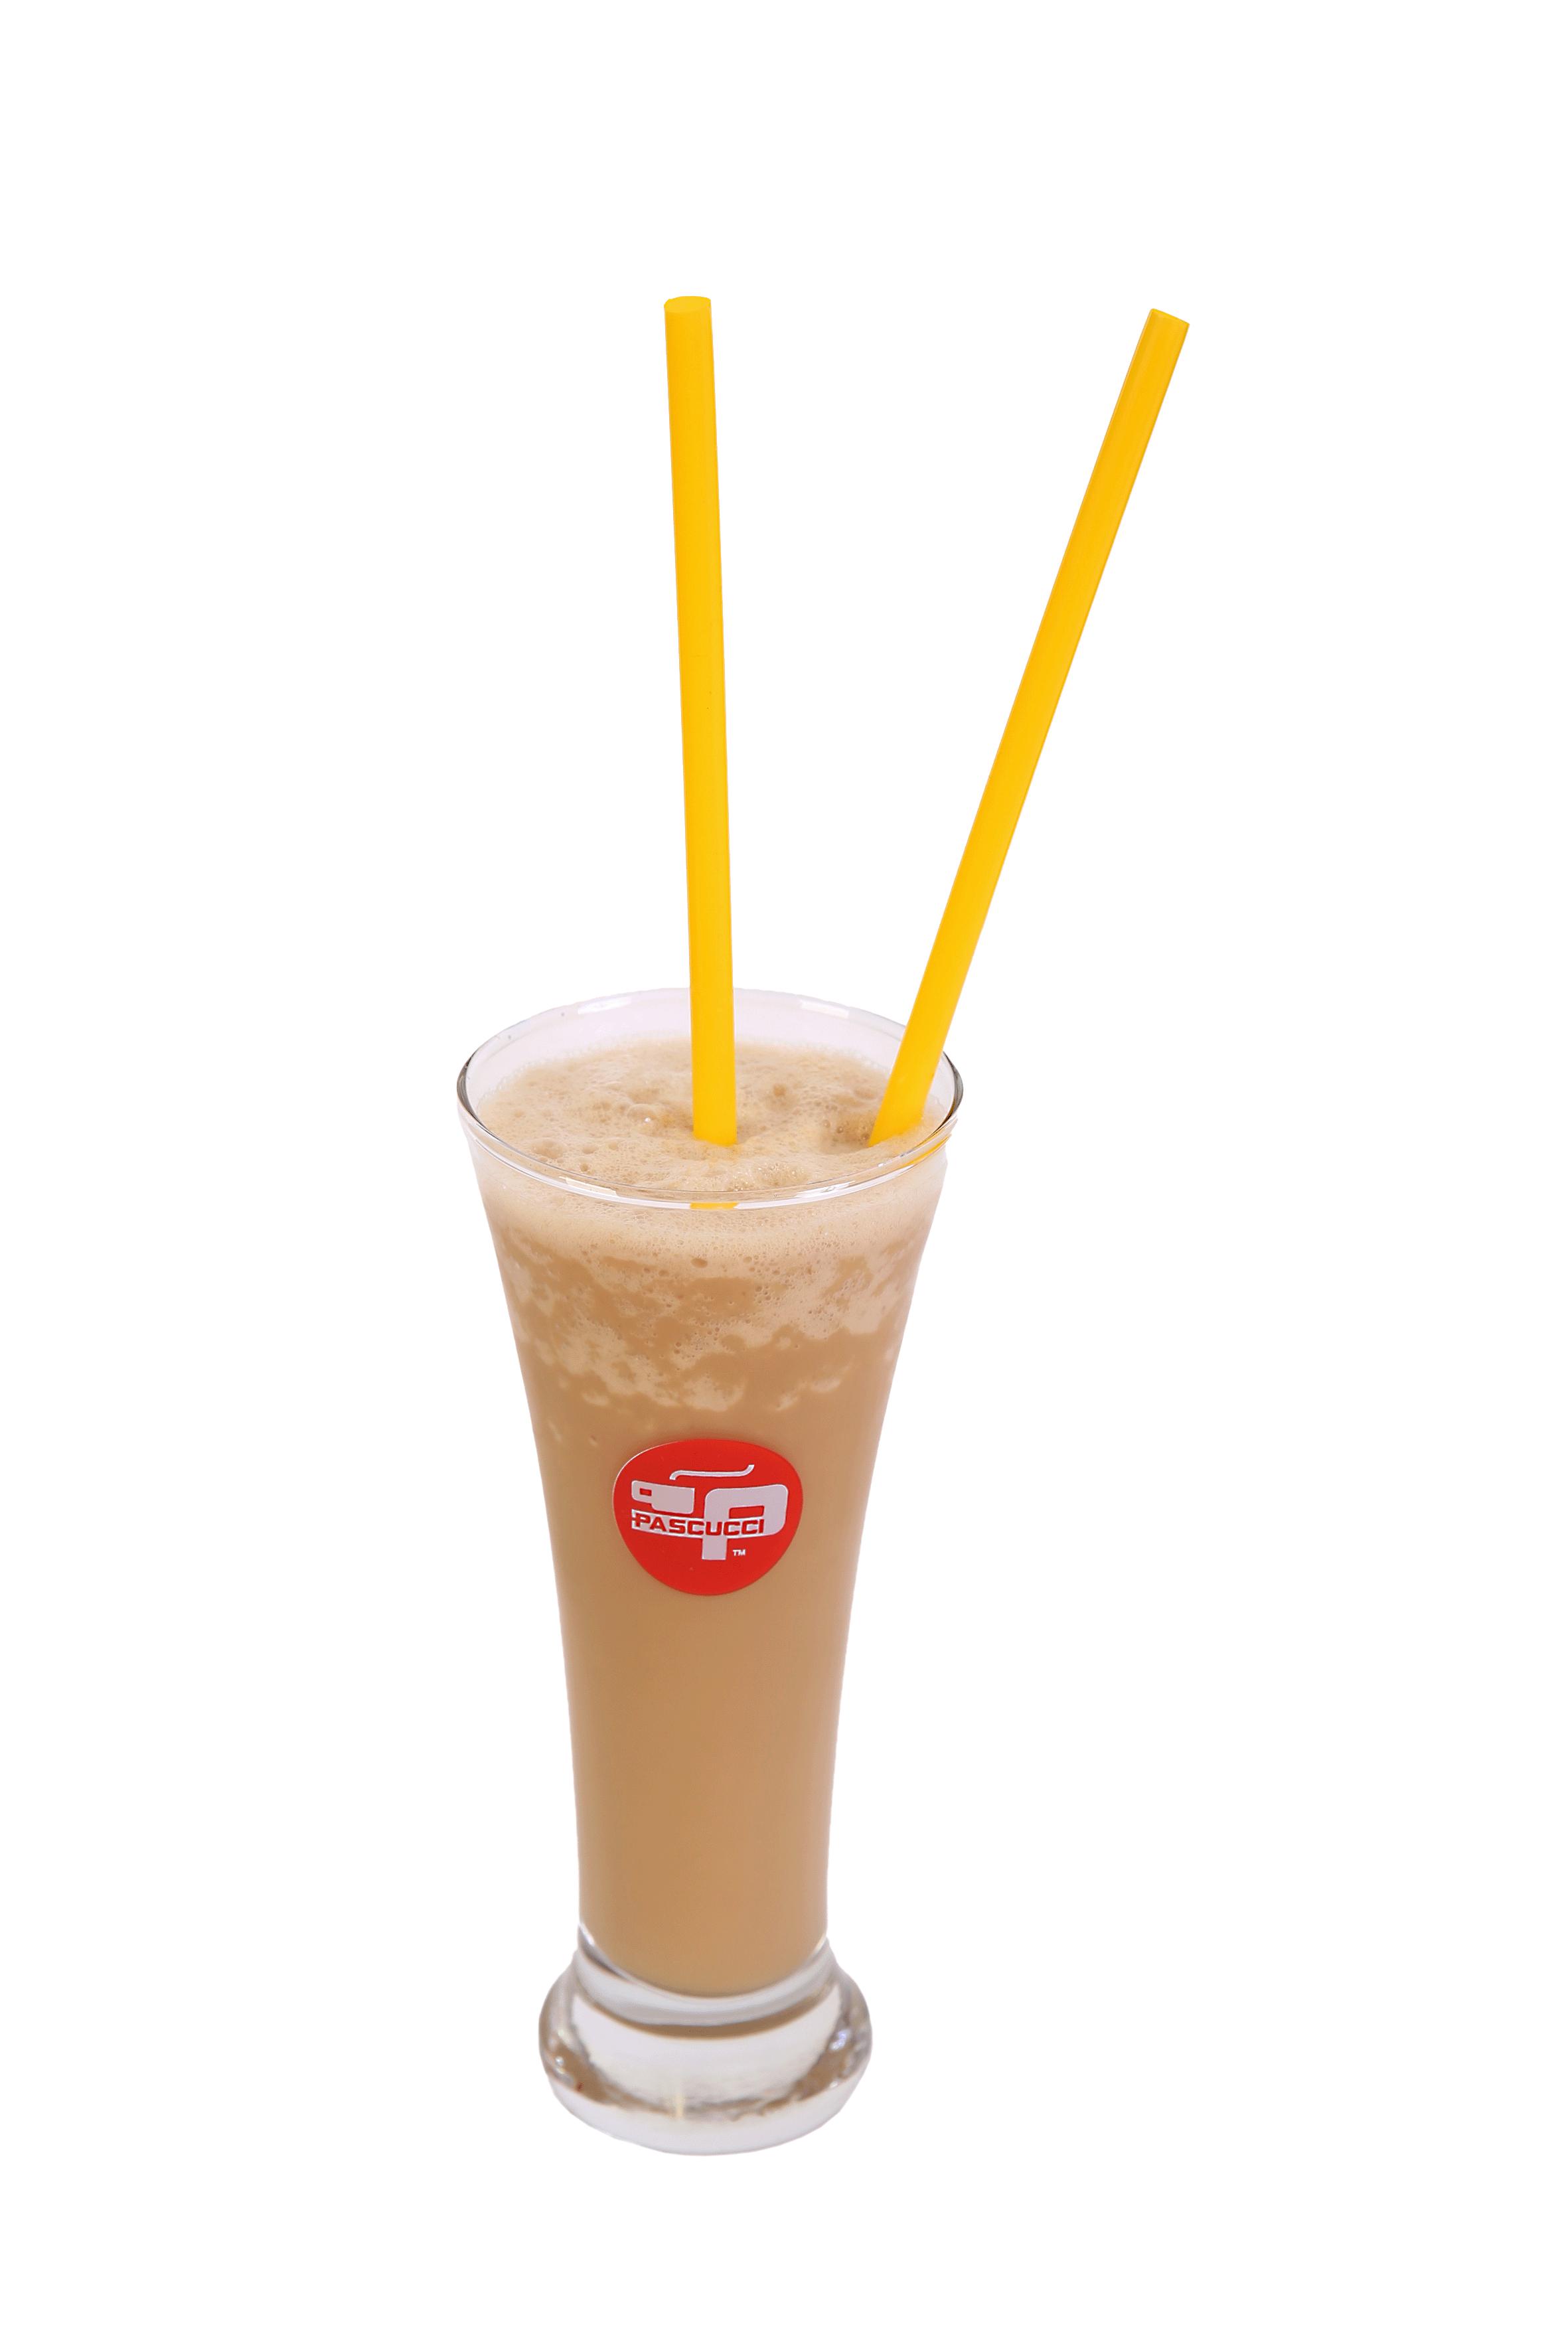 Kavove sorbetto